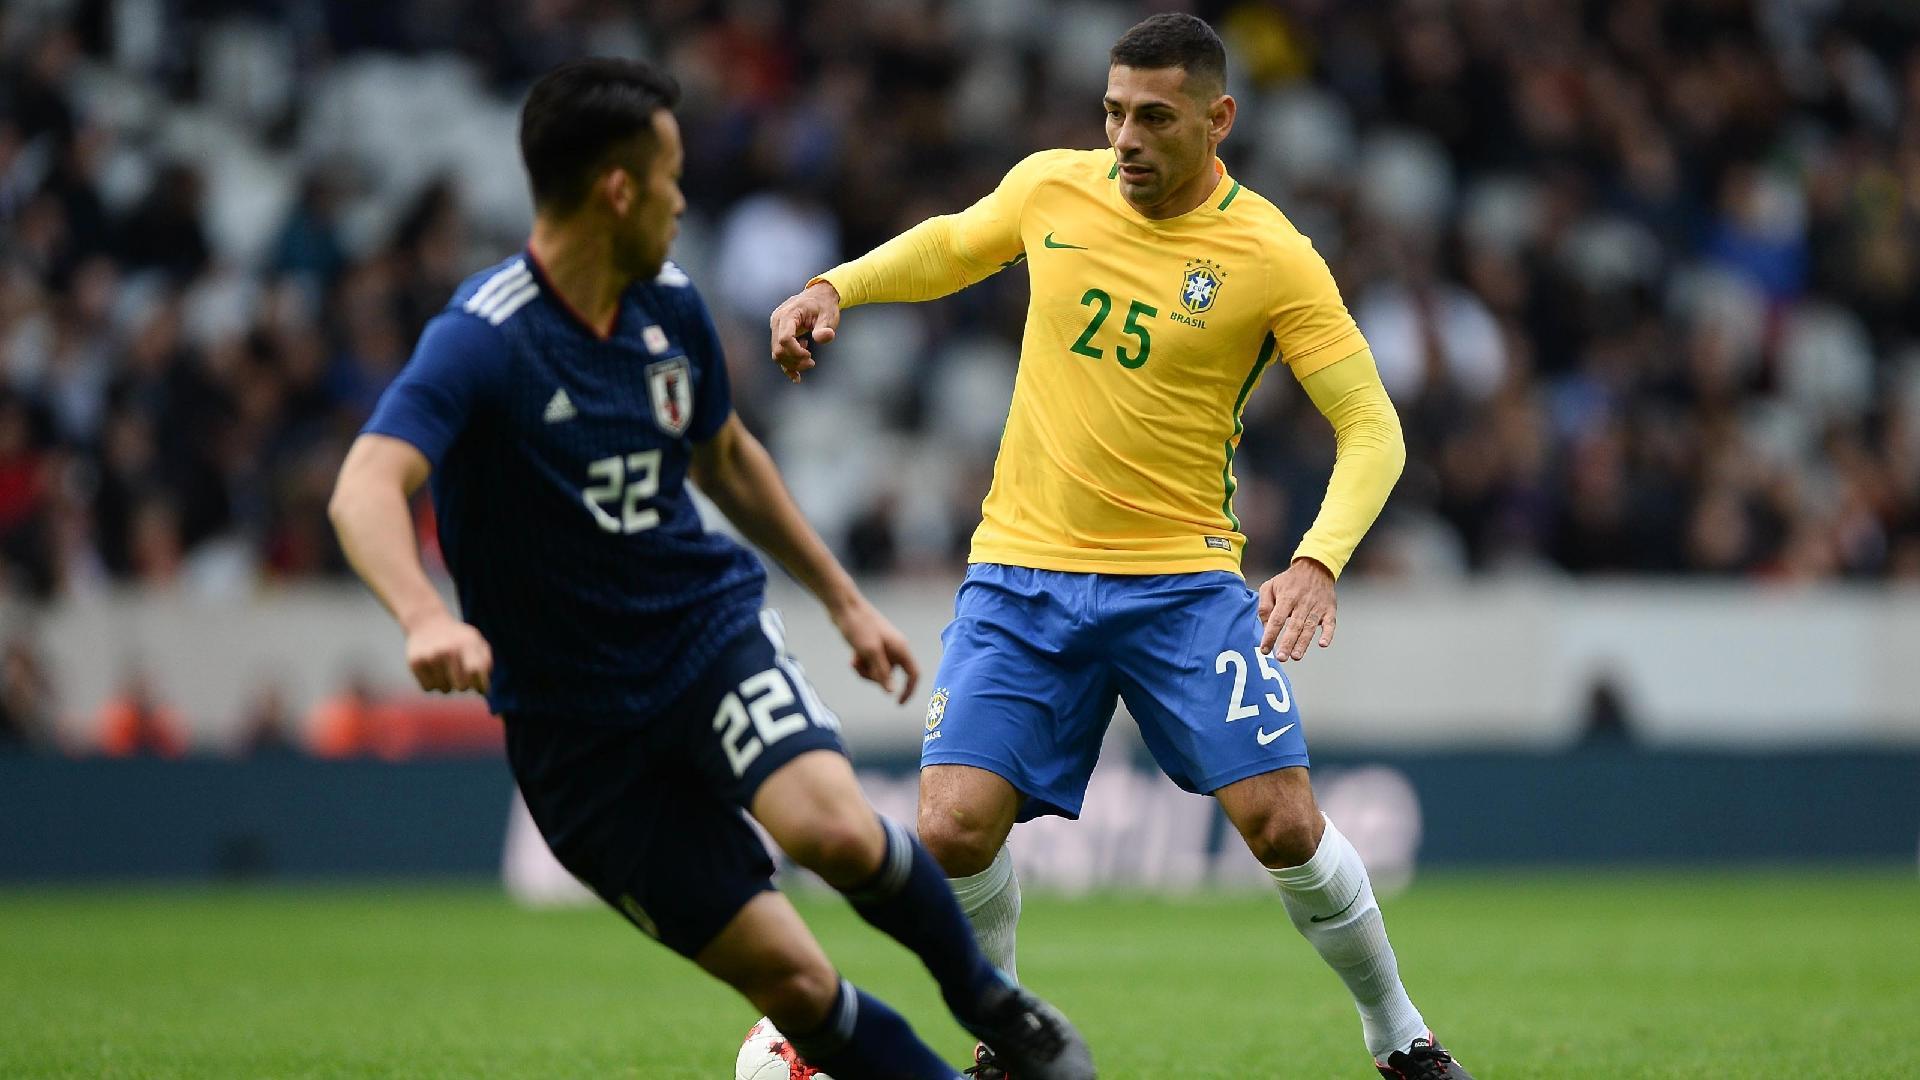 Diego Souza recebe chance de Tite no segundo tempo